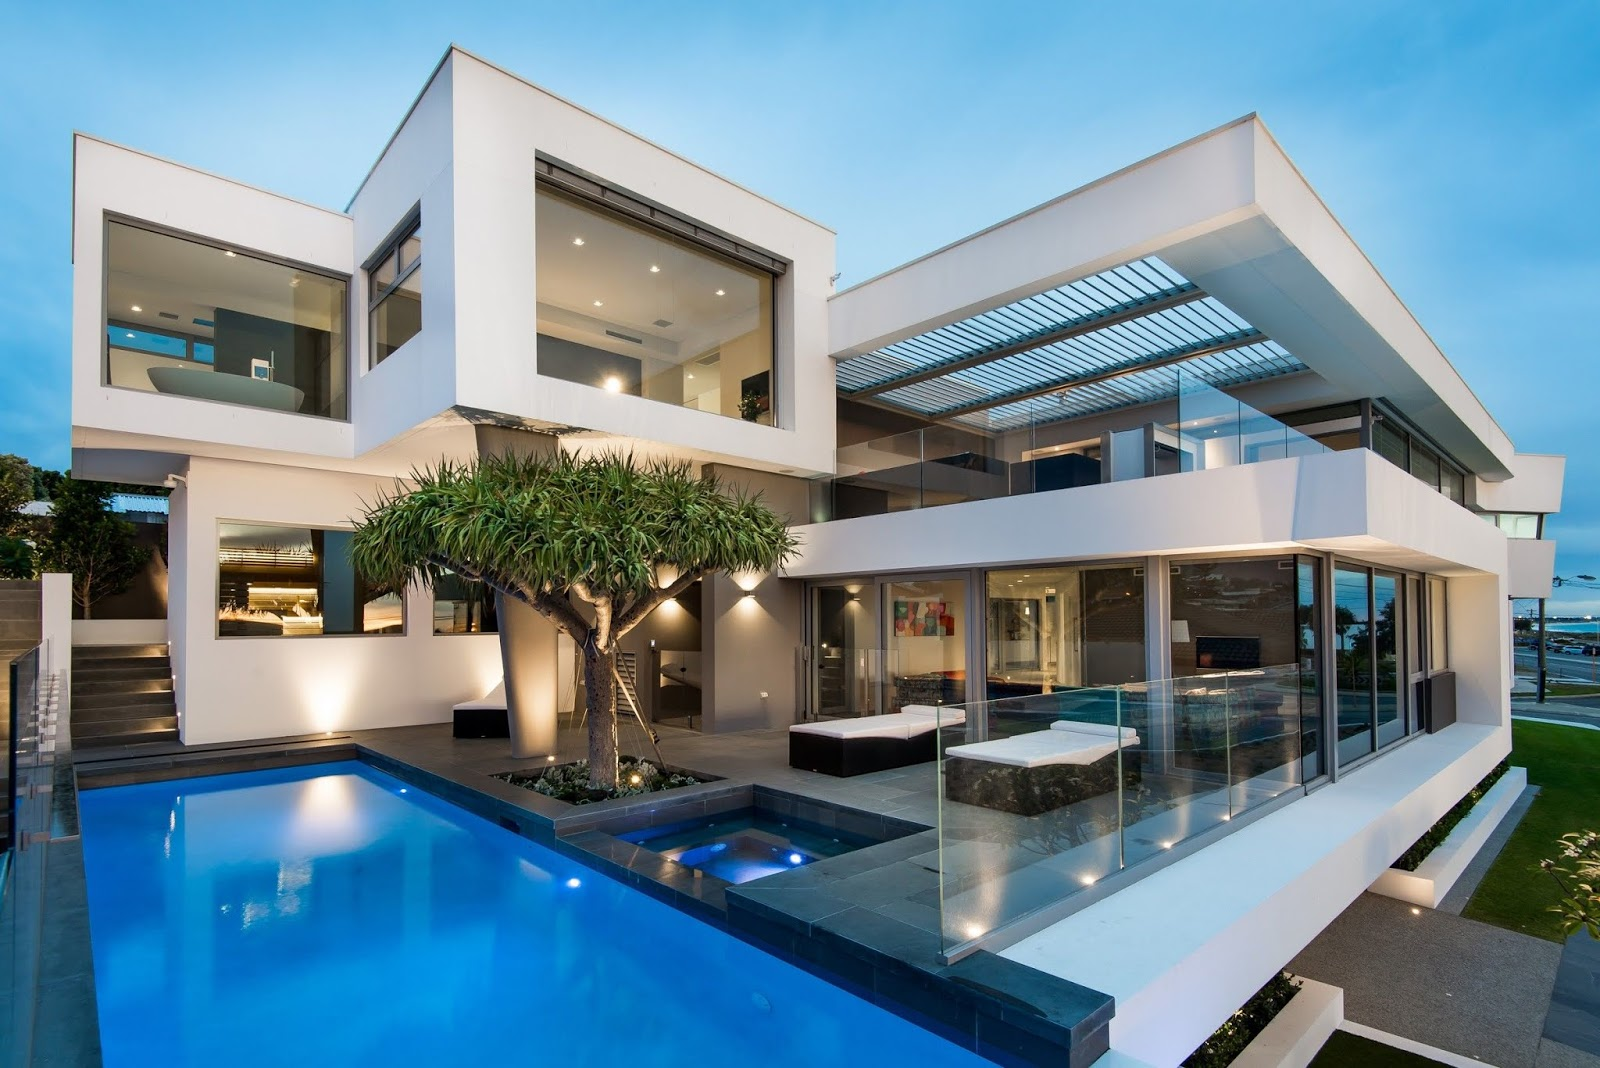 architecture interior design ideas beach house design ideas at rh idezen blogspot com